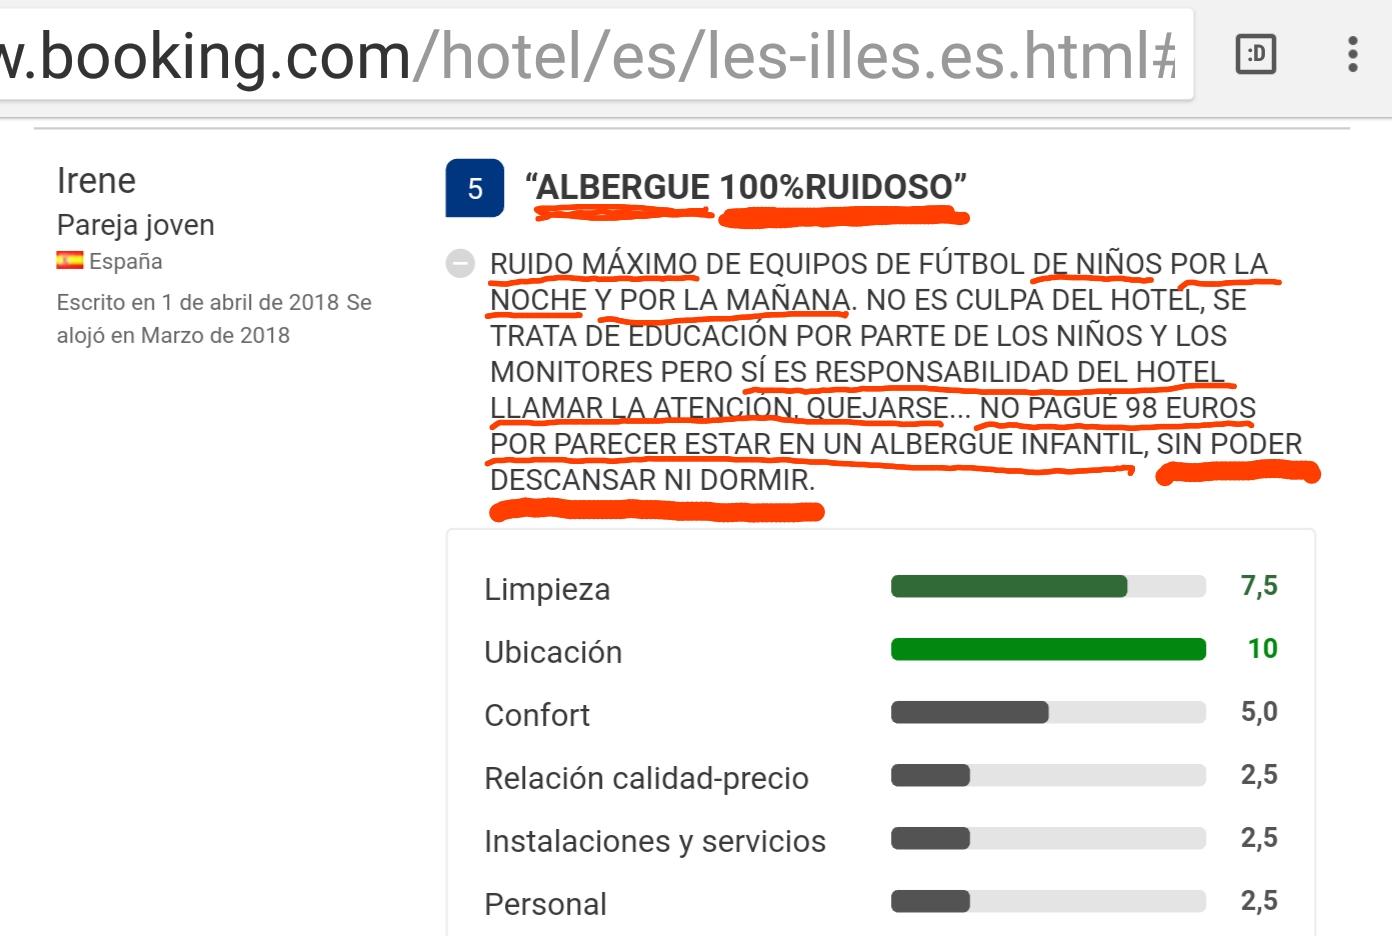 Opinion Hotel les illes Estartit booking